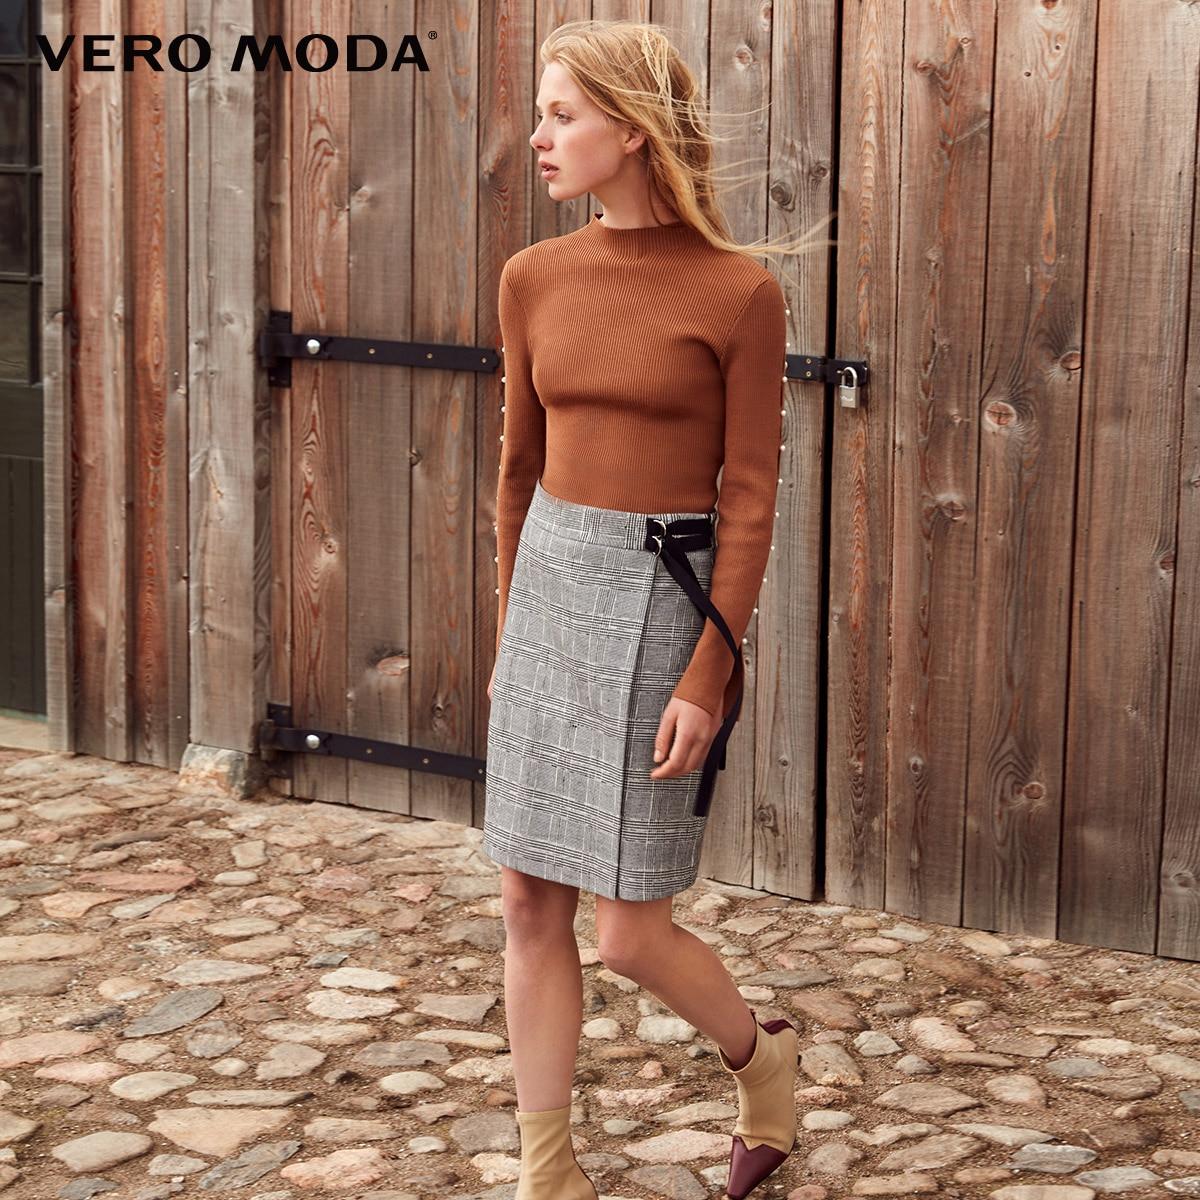 Vero Moda Women's Decorative Ribbon Houndstooth Skirt | 319116525